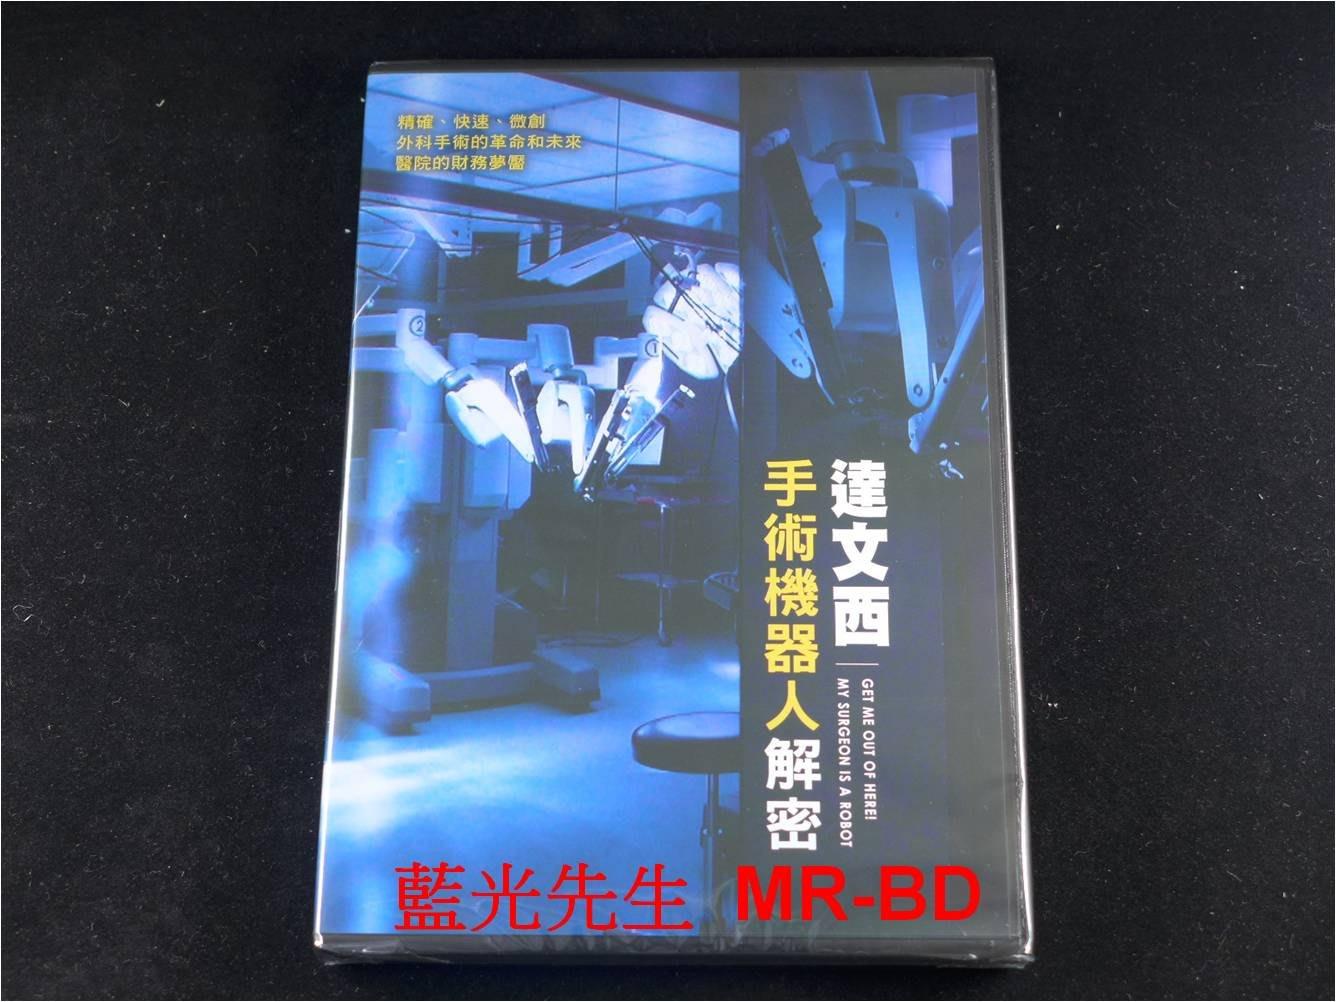 [DVD] - 達文西手術機器人解密 Get Me Out of Here! My Surgeon i ( 台灣正版 )